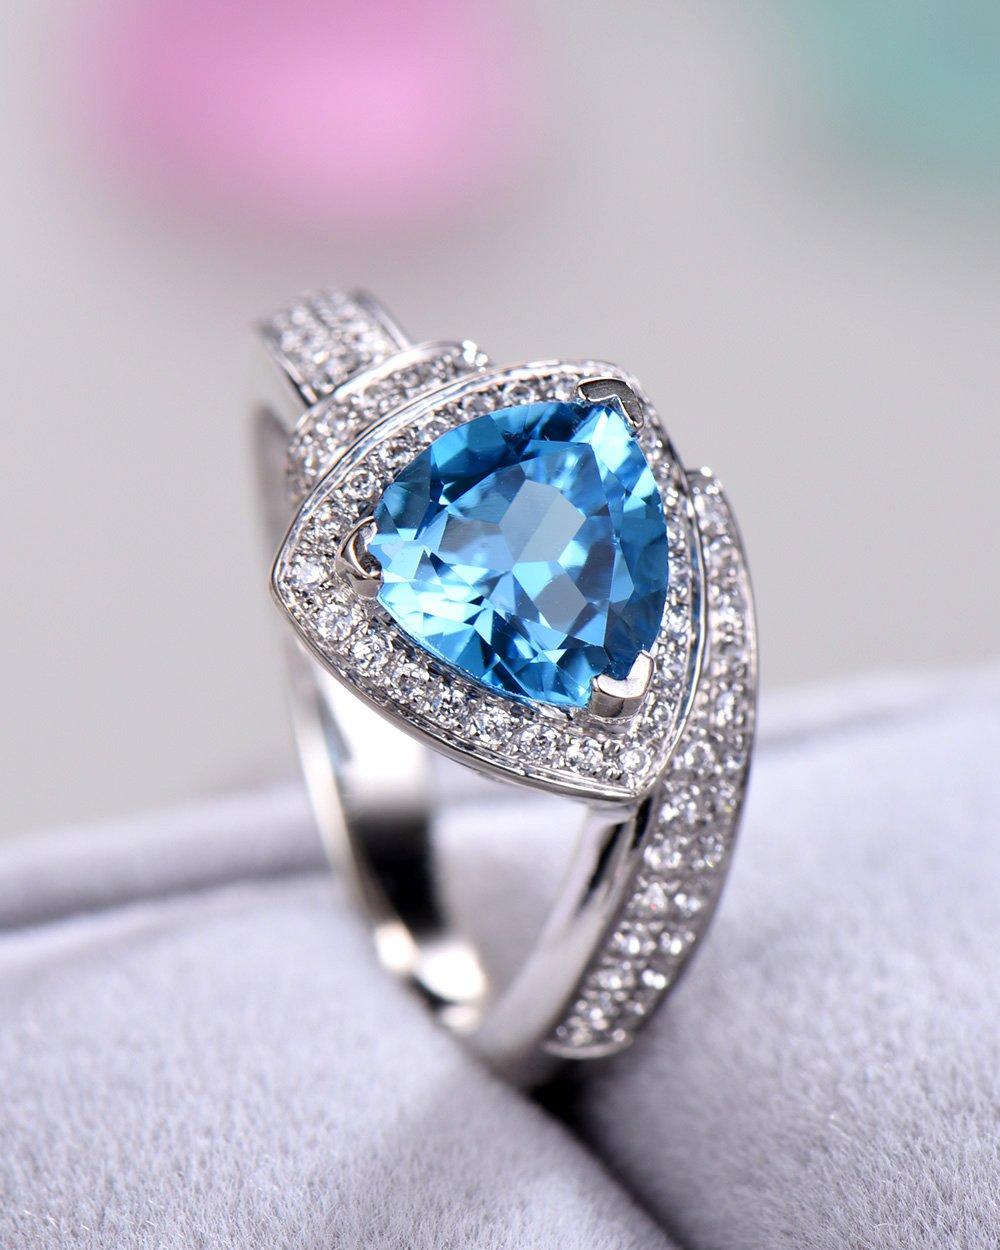 Blue Topaz Wedding Ring Trillion Cut 925 Sterling Silver White Gold CZ Diamond Halo Unique Engagement Set by Milejewel Topaz Engagement Ring (Image #2)